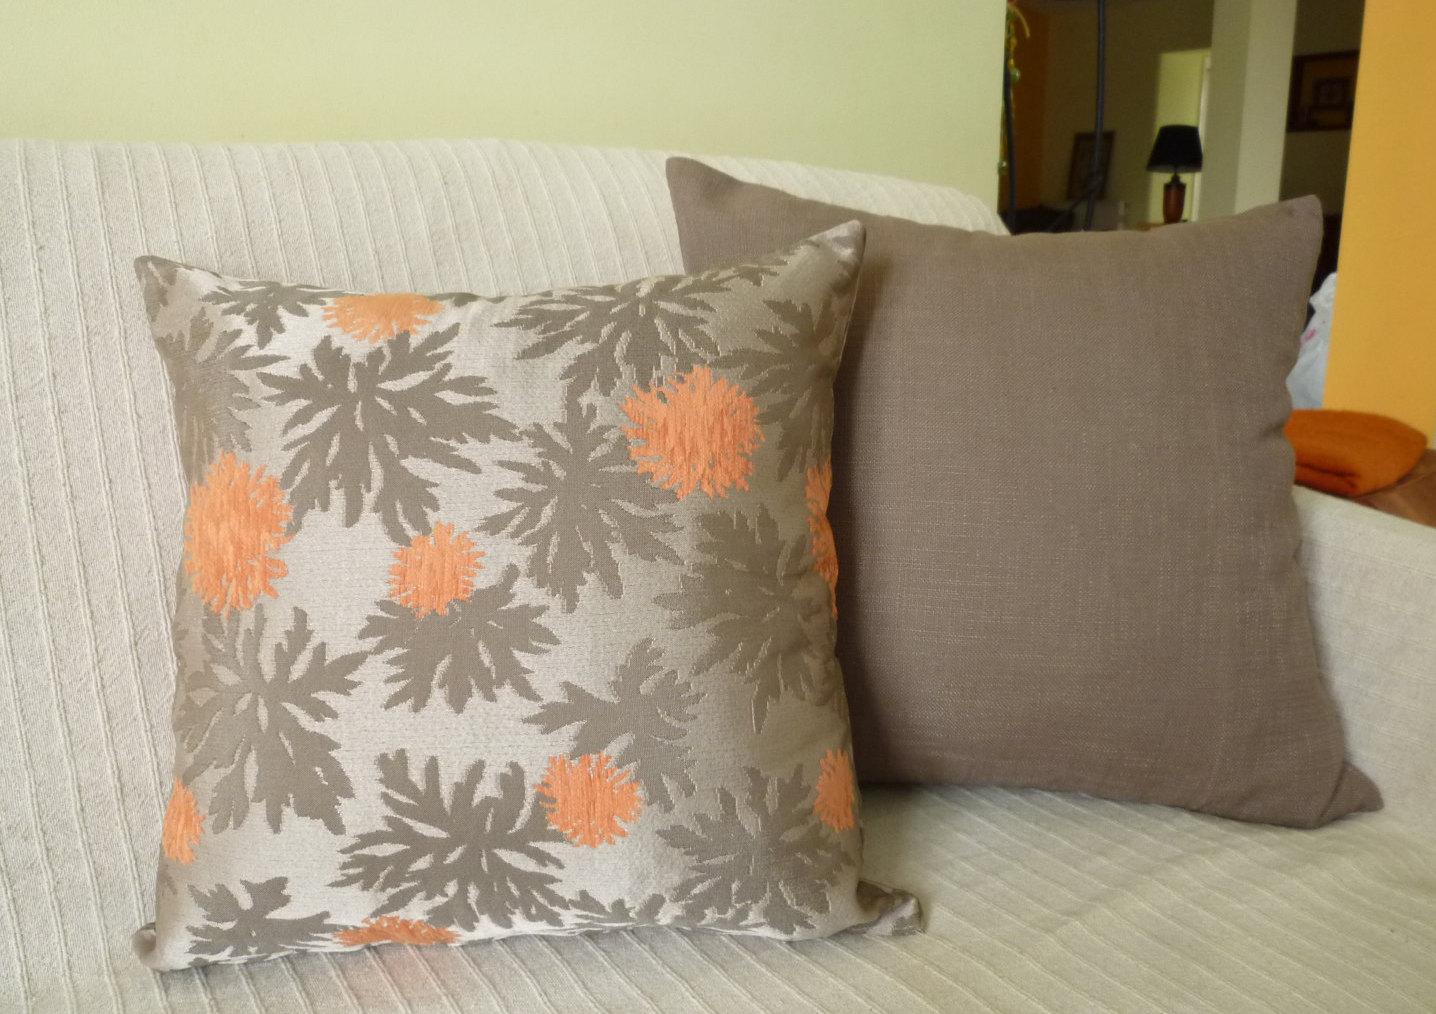 Taffeta chenille fabric decorative throw pillow 18x18 inches - Fabric for throw pillows ...